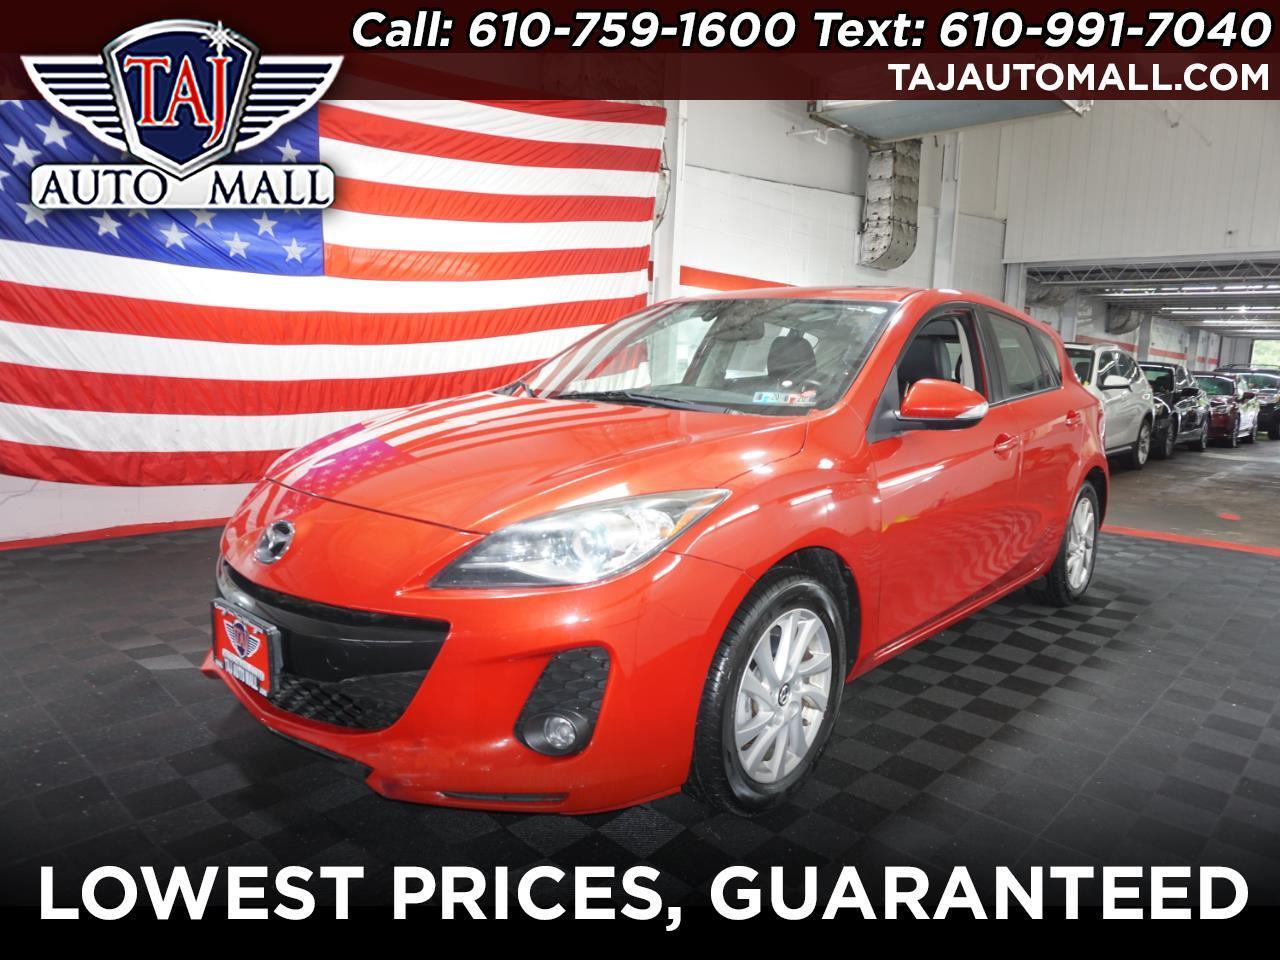 2013 Mazda MAZDA3 i Grand Touring MT 5-Door